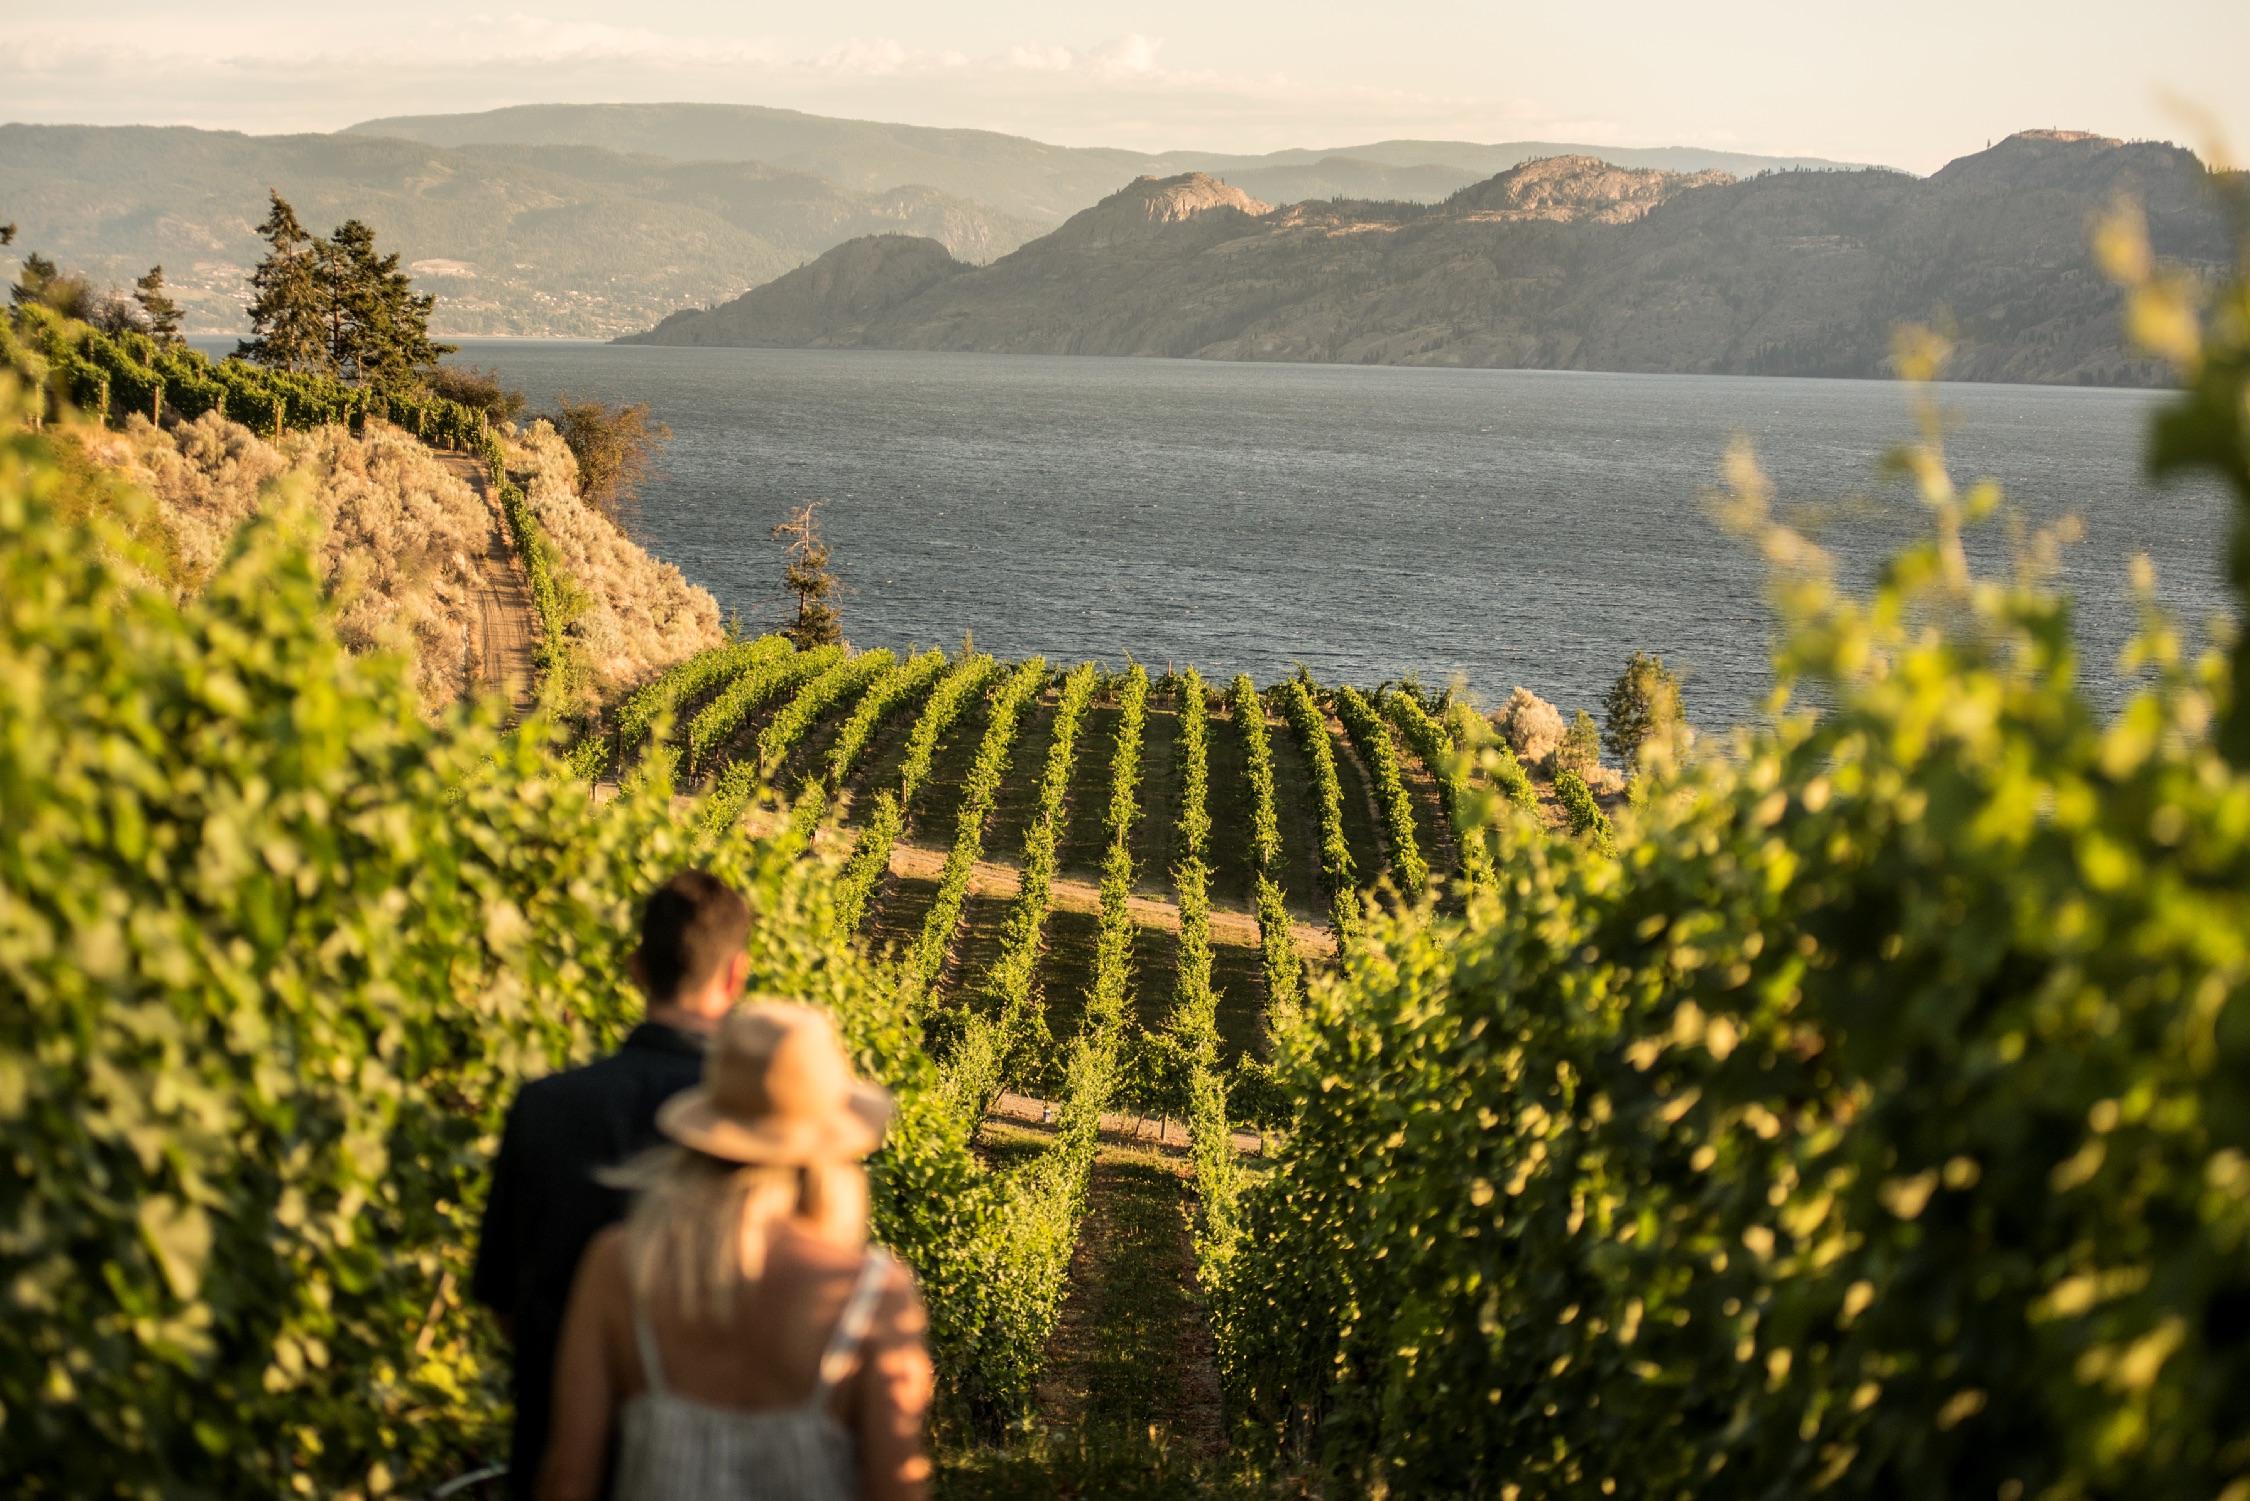 A young couple walks 户外冒险、品酒之旅和湖畔休闲